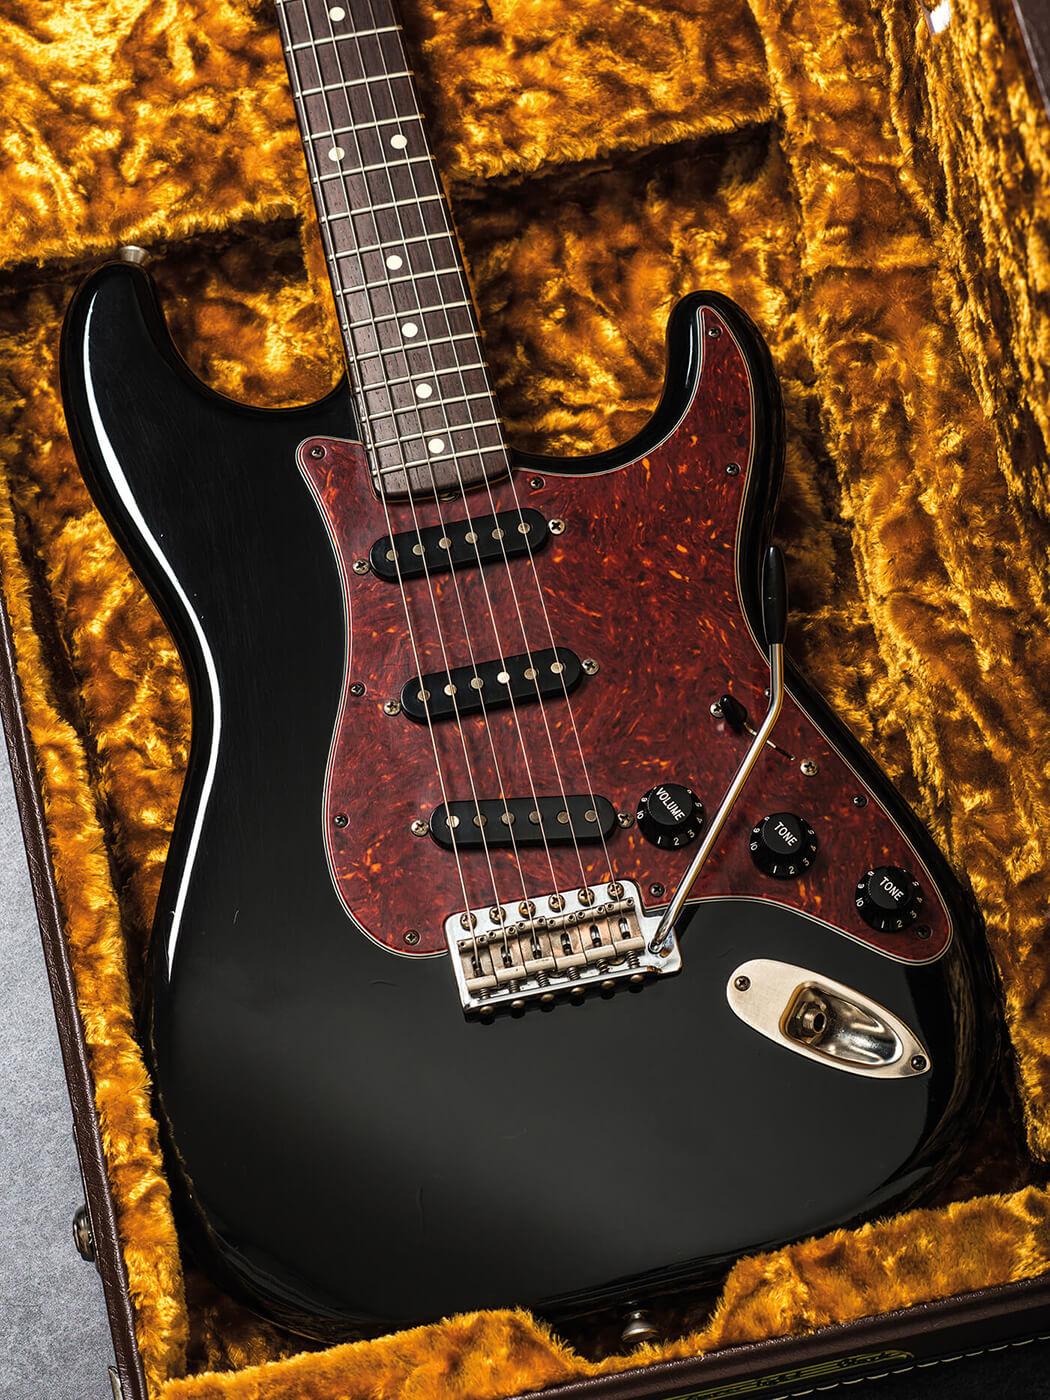 Macmull Guitars Diamond Superlight S Classic